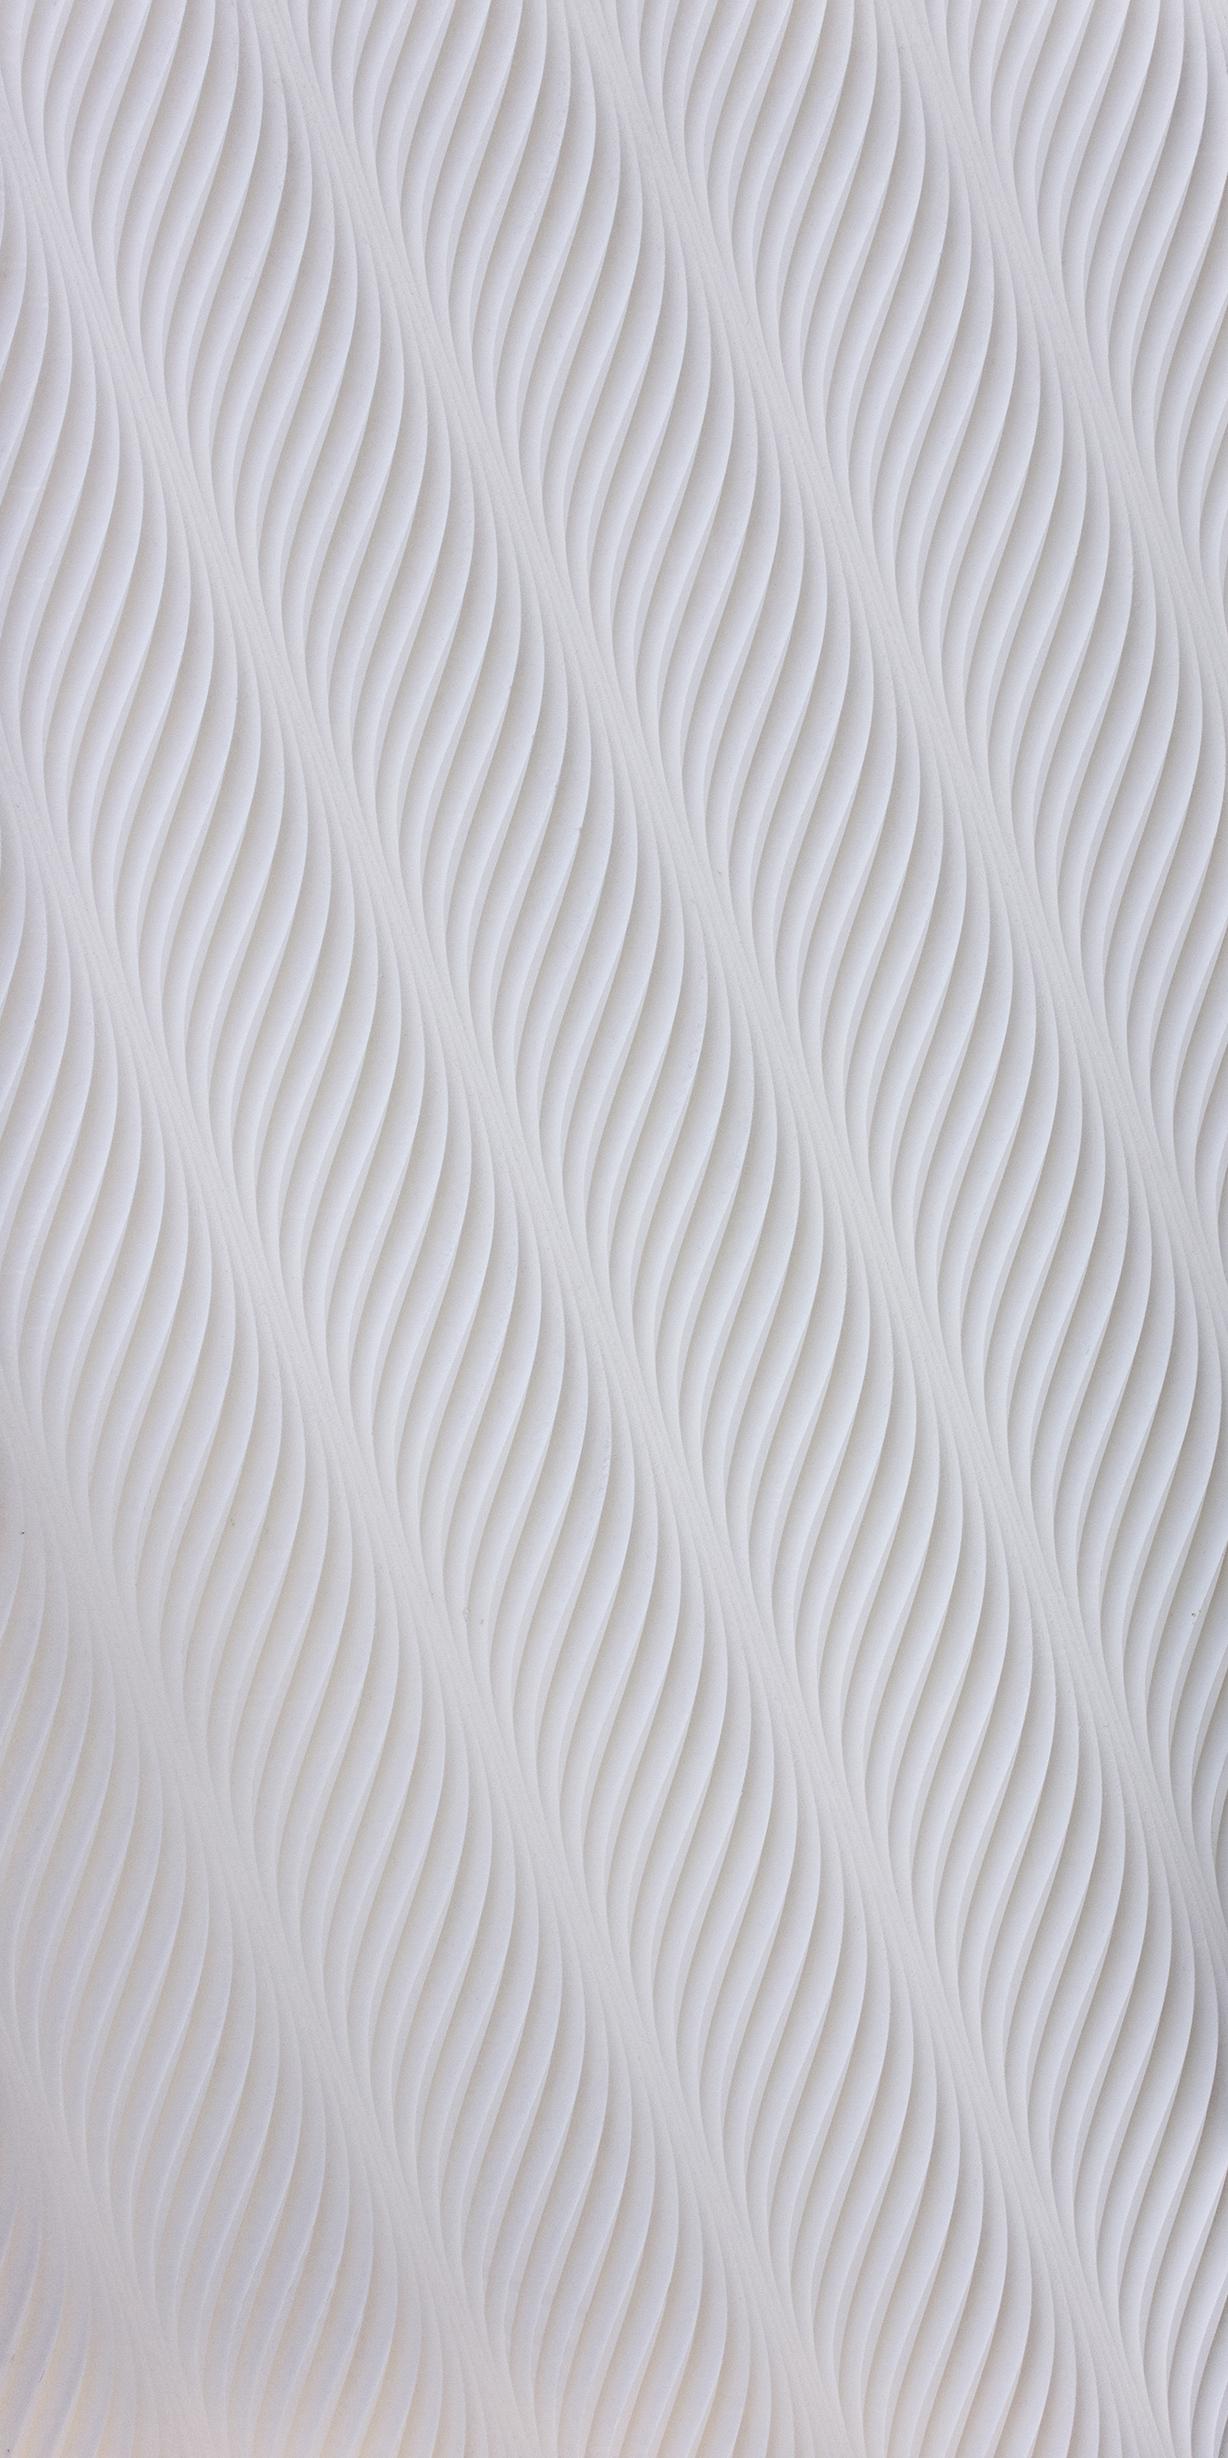 Paneles MDF de Relieve 3D y Grill